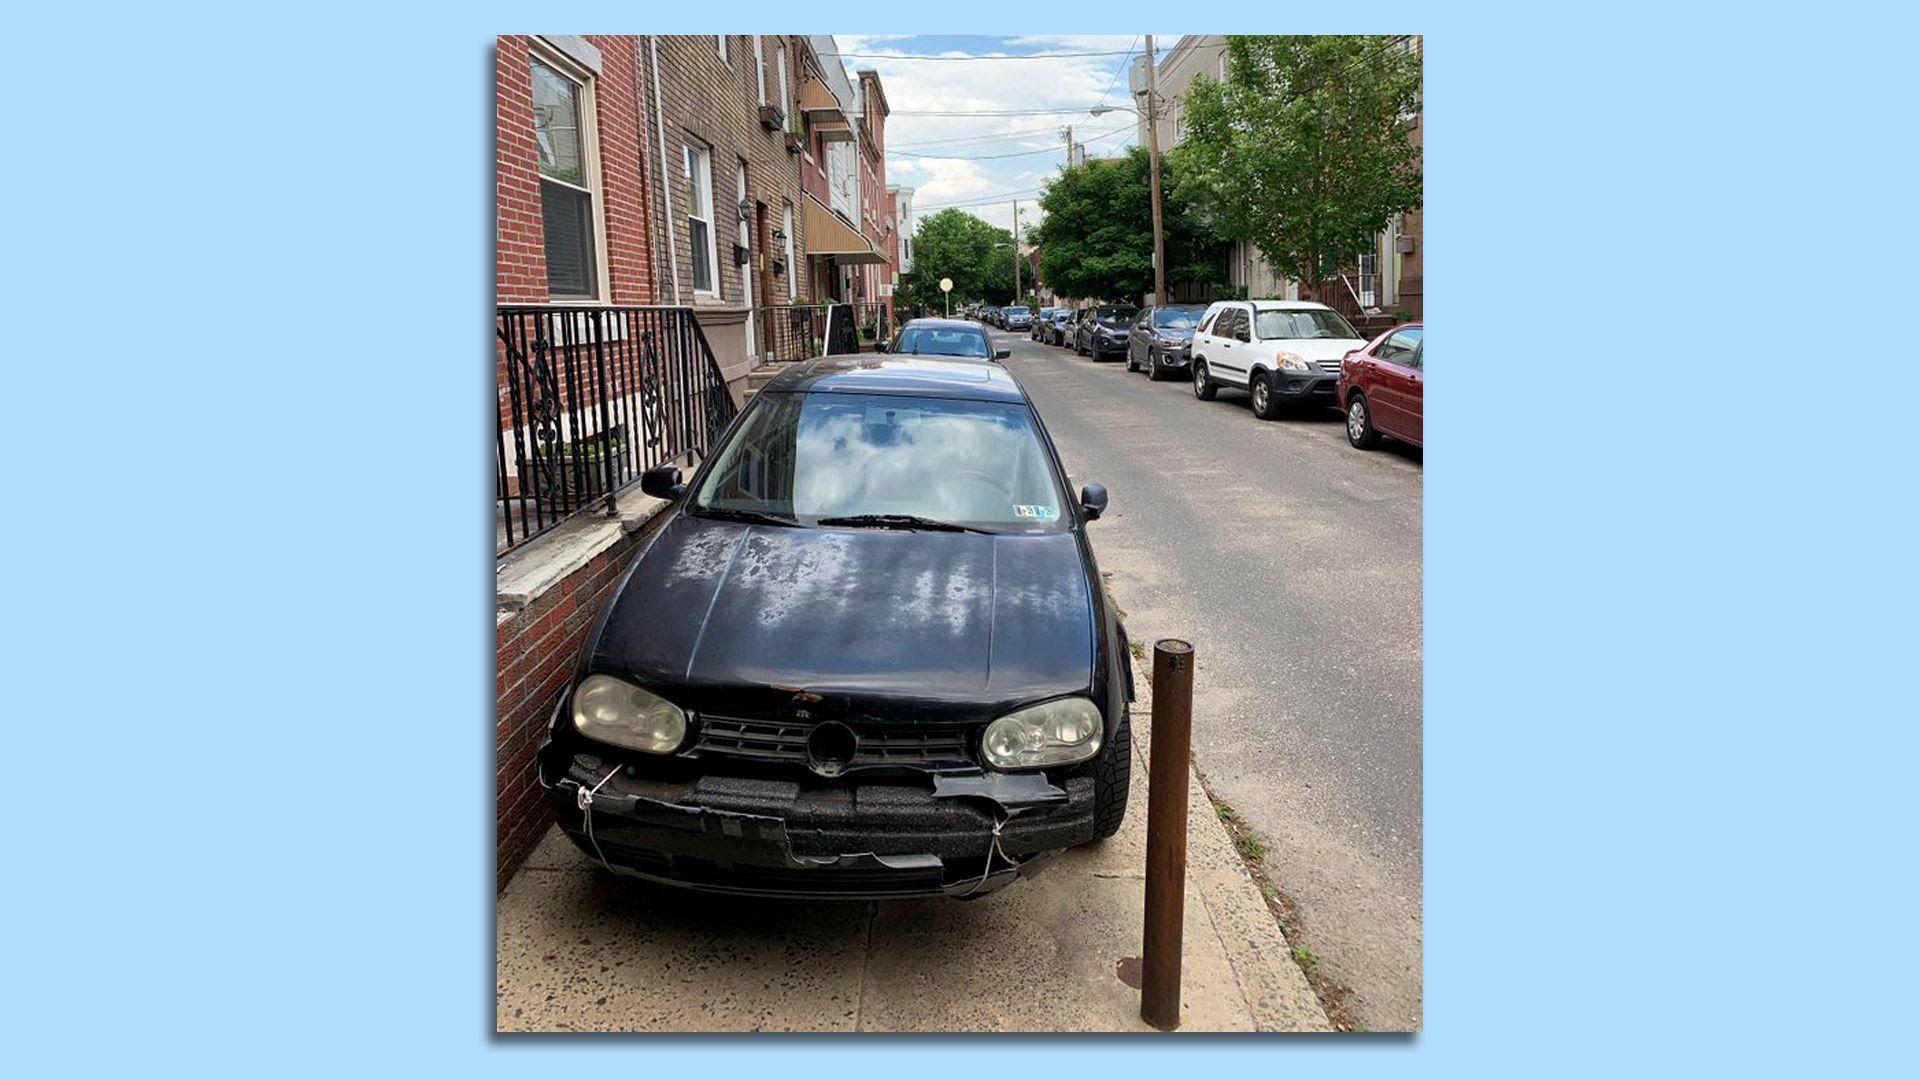 A car parks illegally on a curb in Philadelphia.